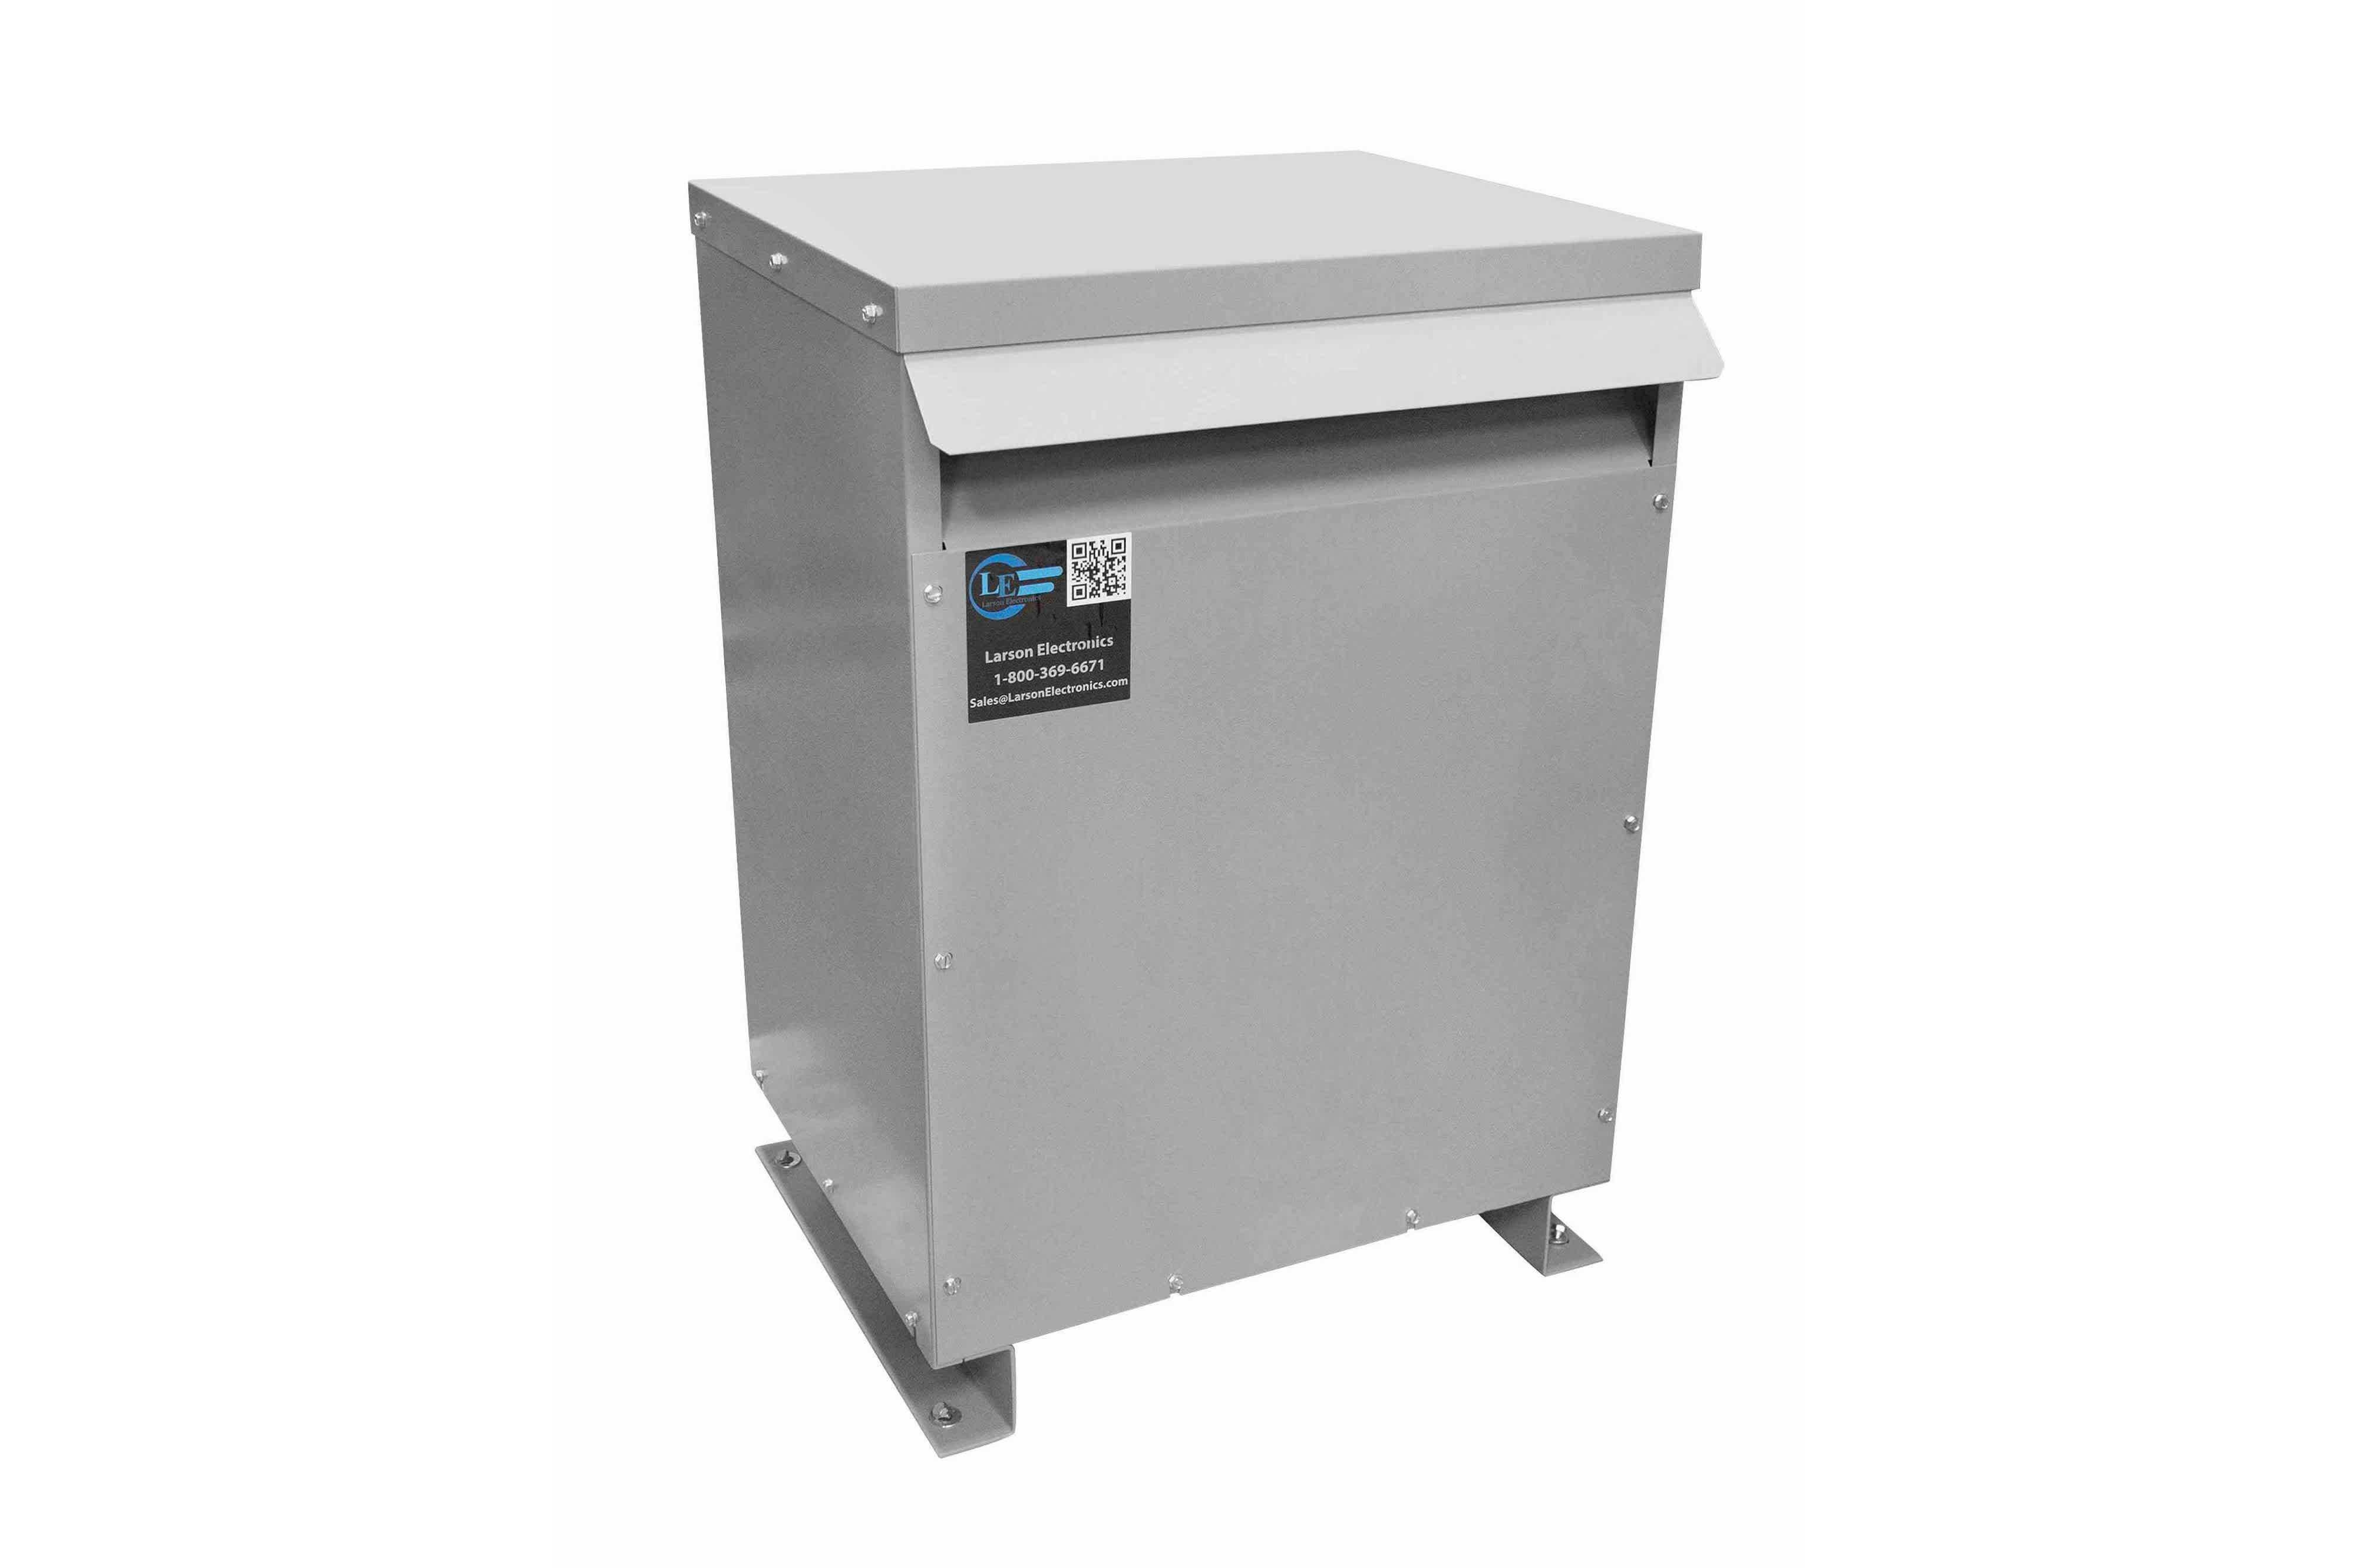 100 kVA 3PH Isolation Transformer, 575V Wye Primary, 208V Delta Secondary, N3R, Ventilated, 60 Hz